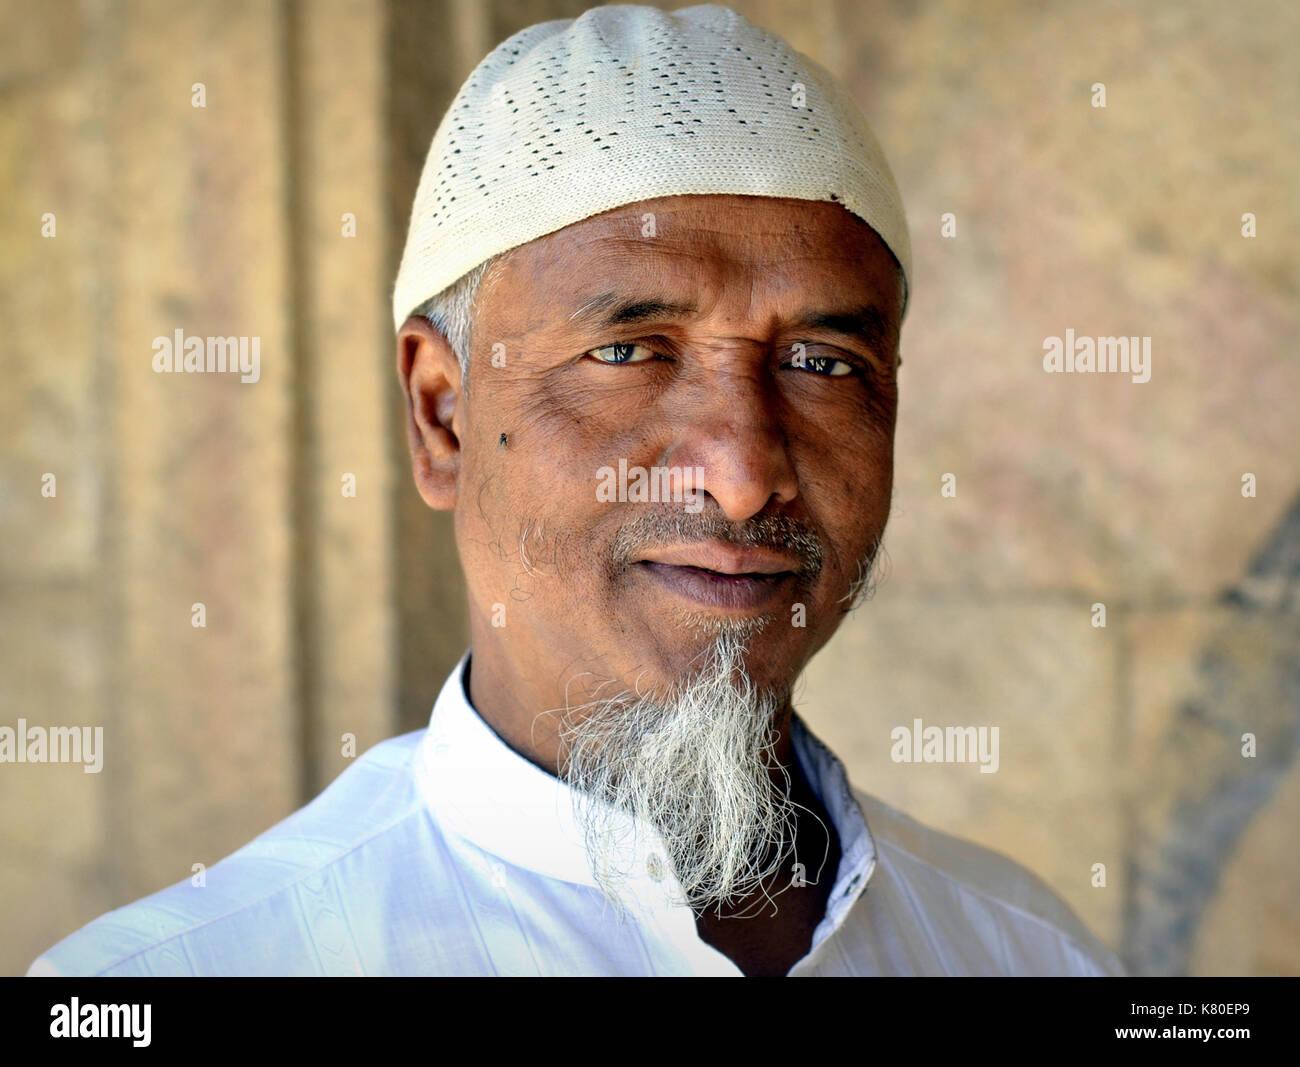 white muslim man